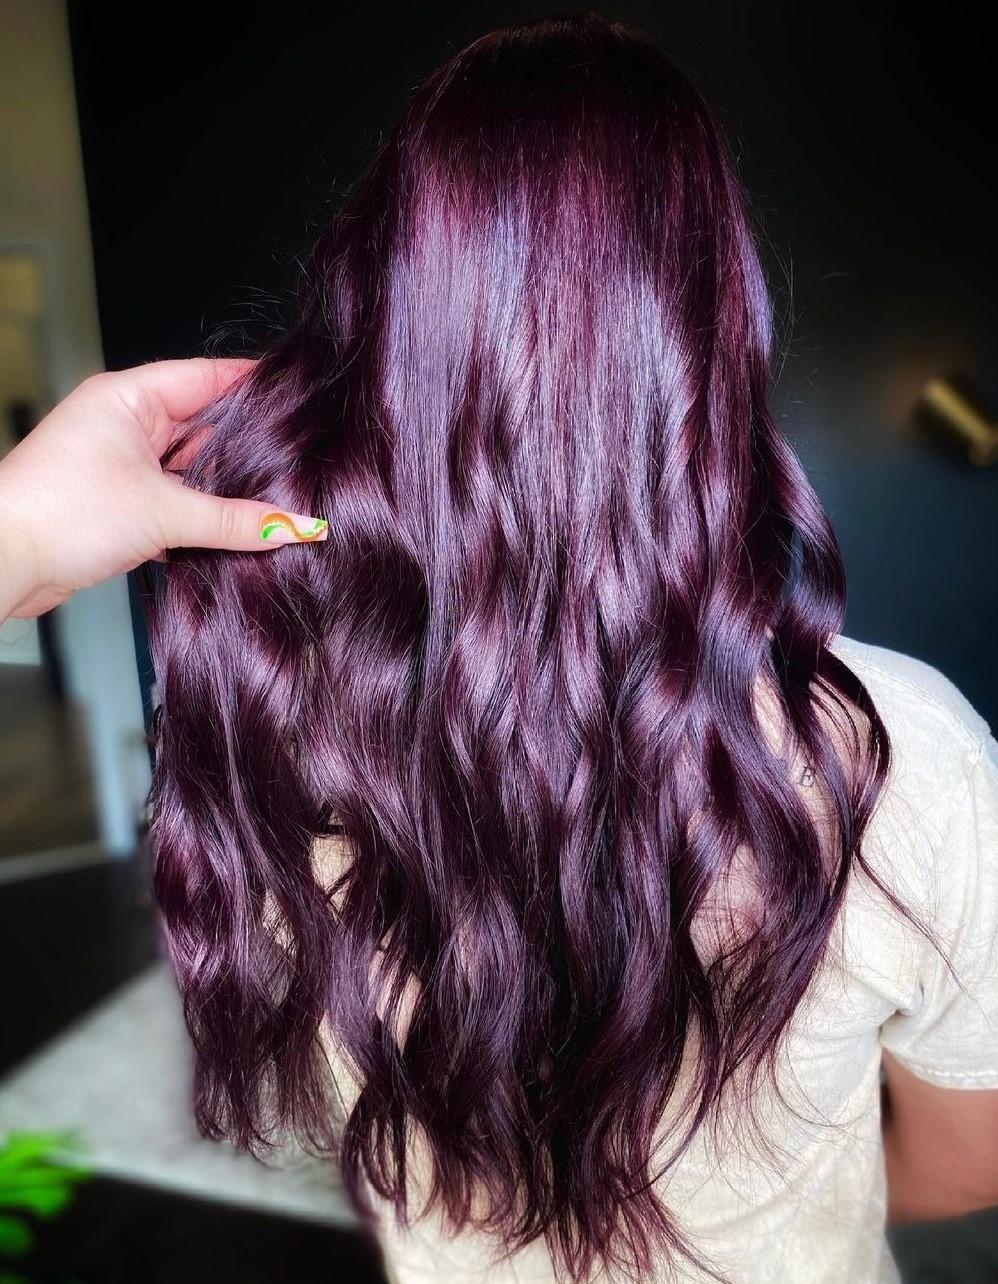 Eggplant Hair Color for Brunettes